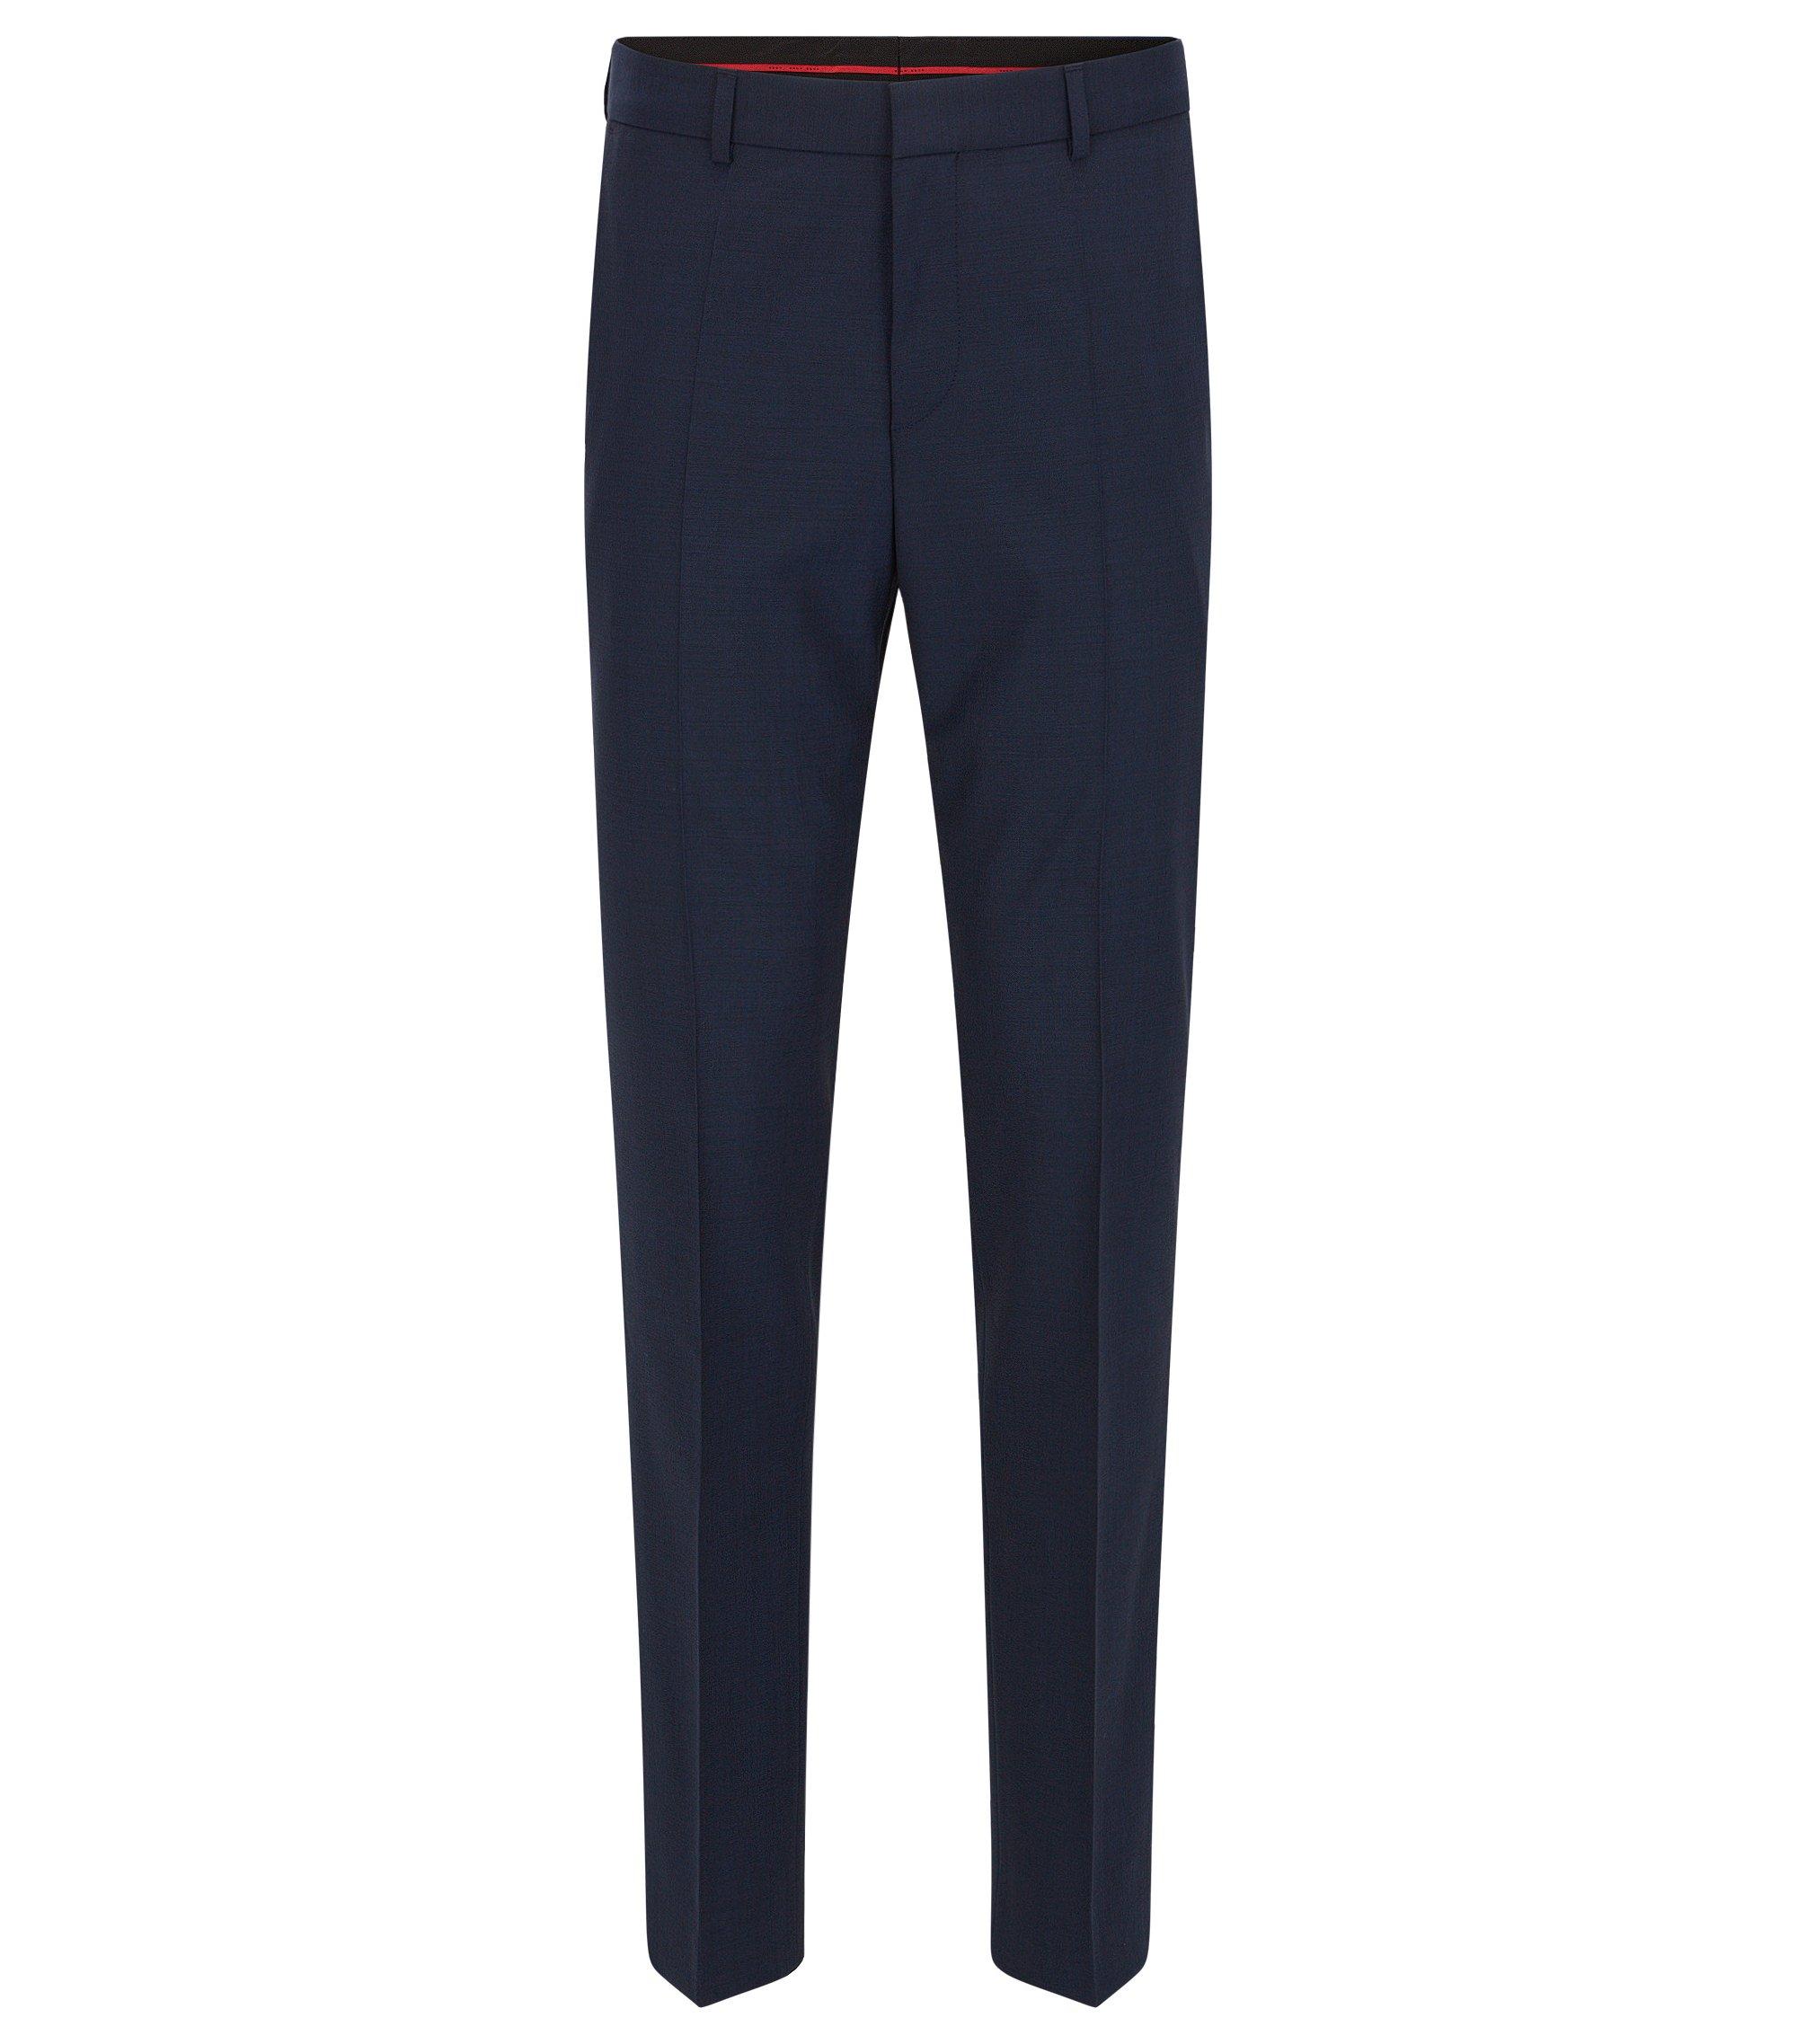 Pantaloni con gamba slim in misto lana , Blu scuro